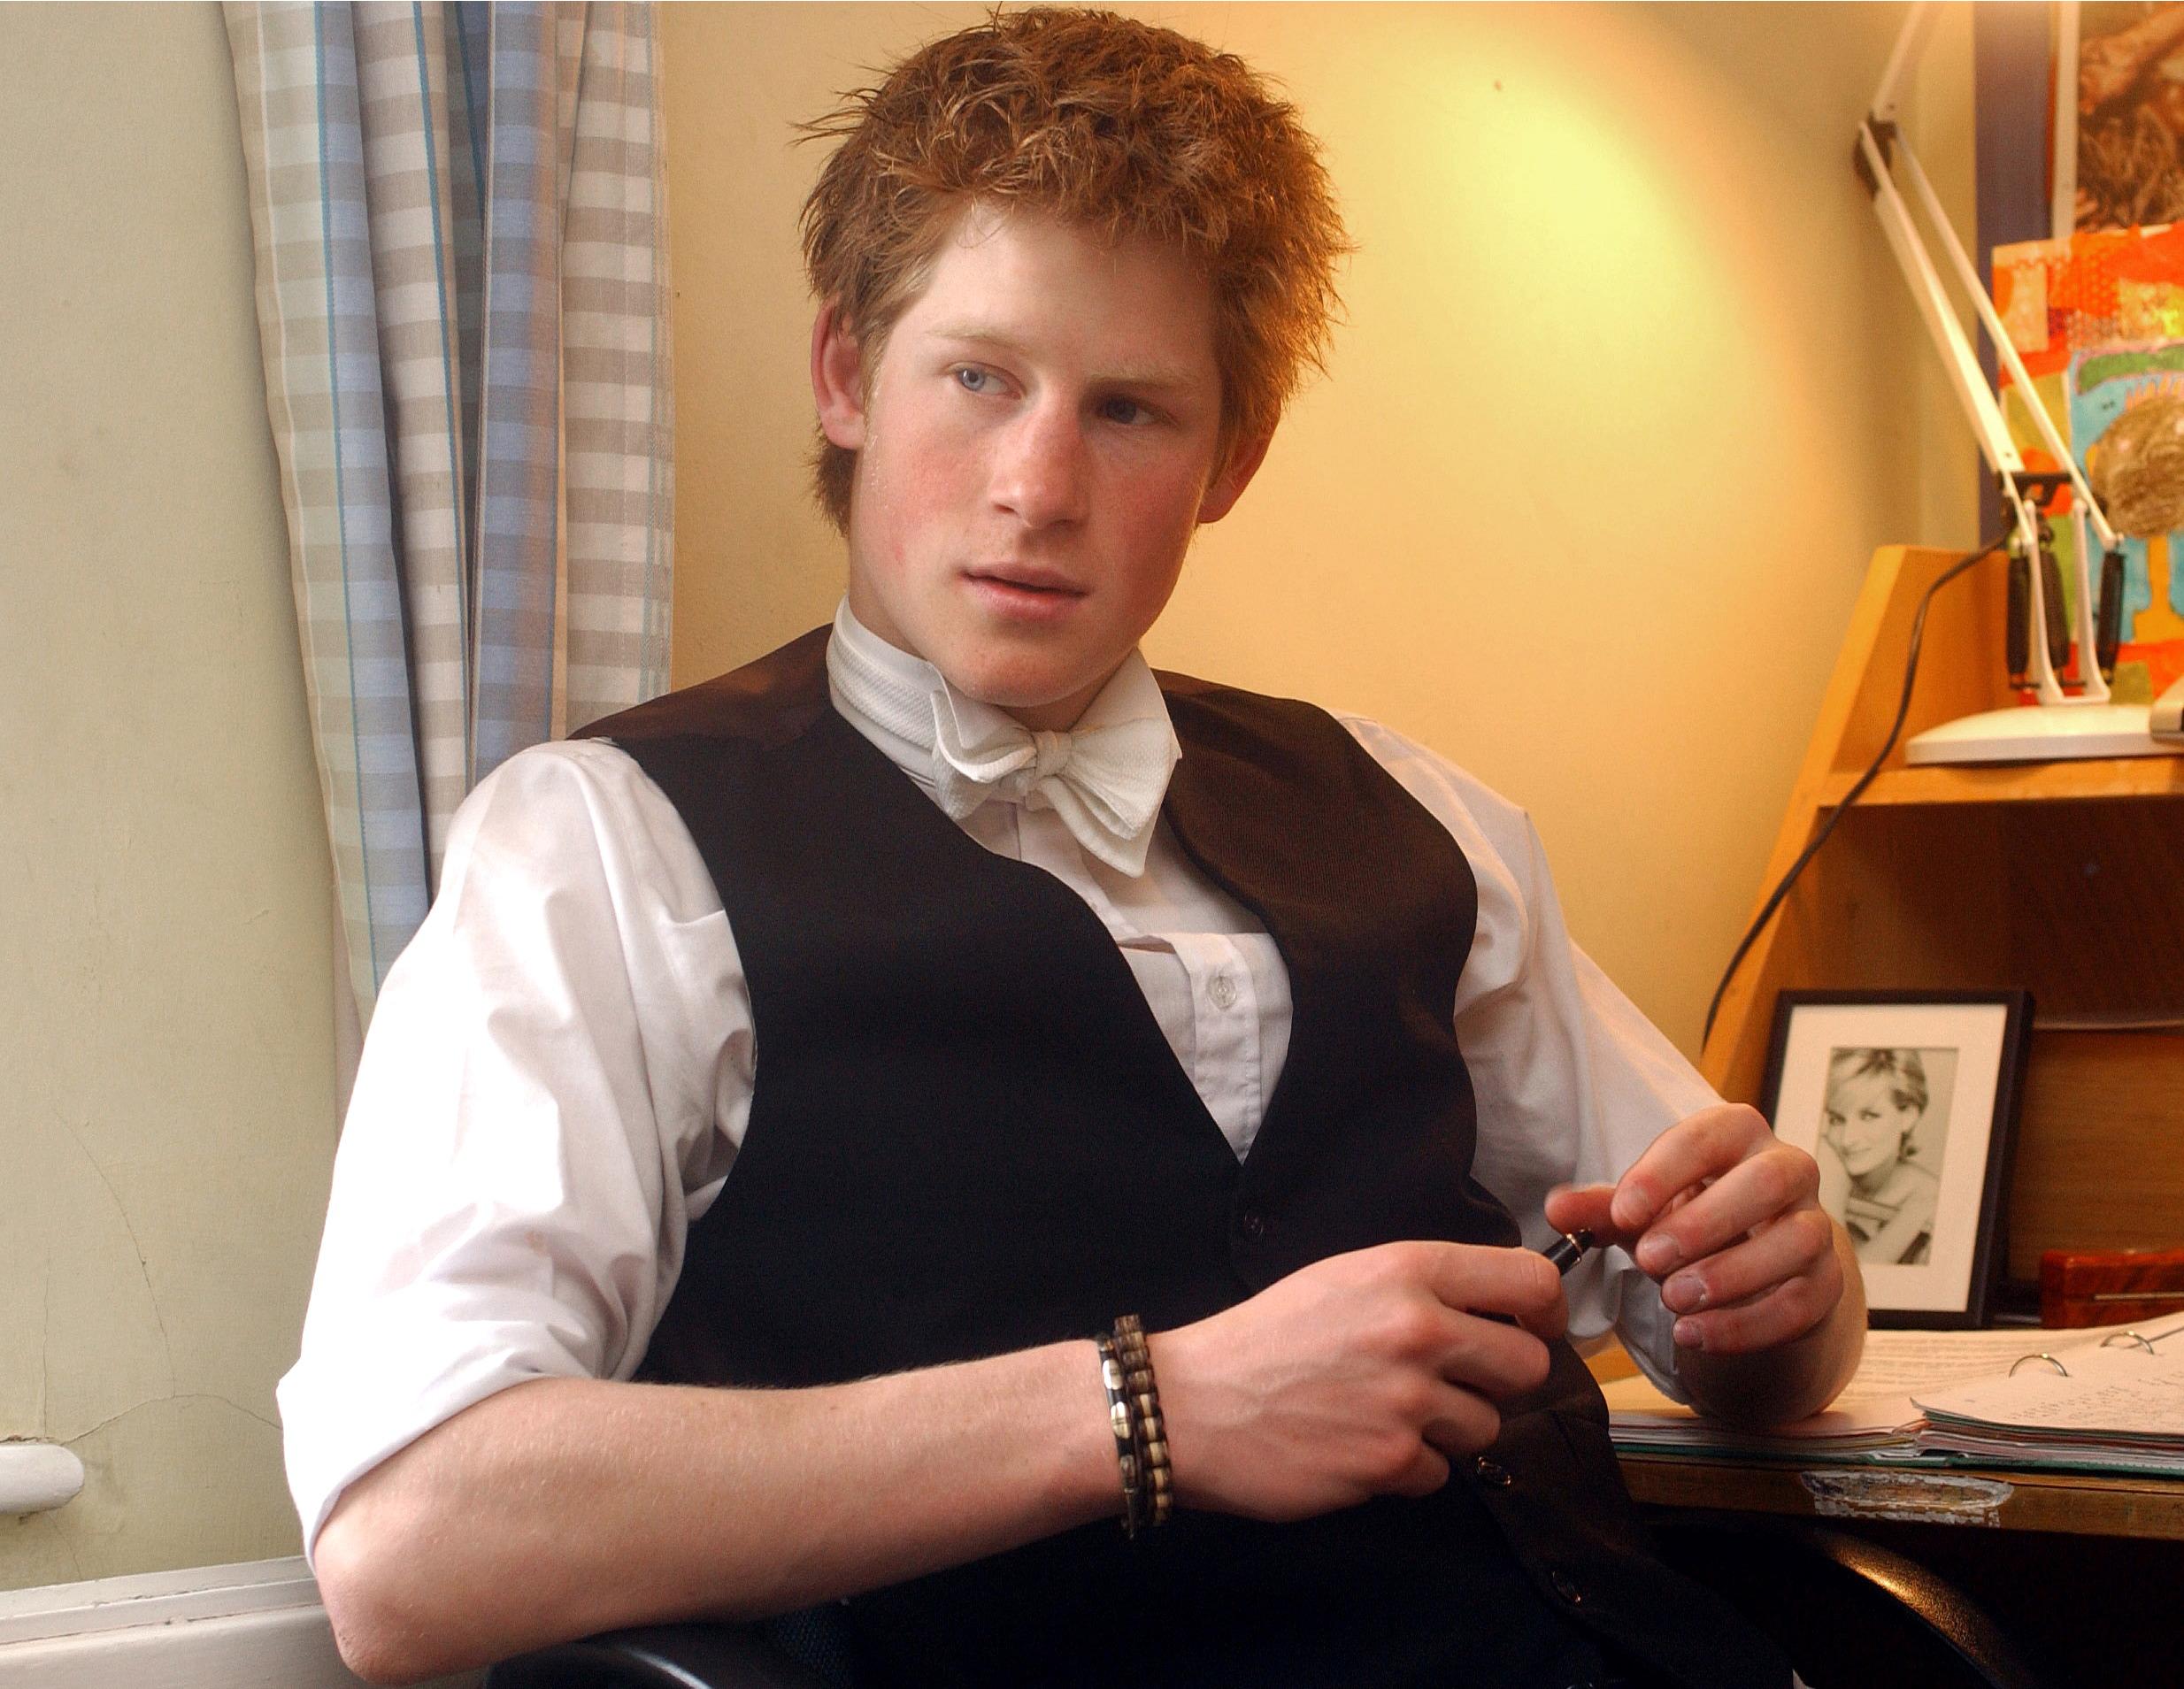 Prince Harry's desk at Eton